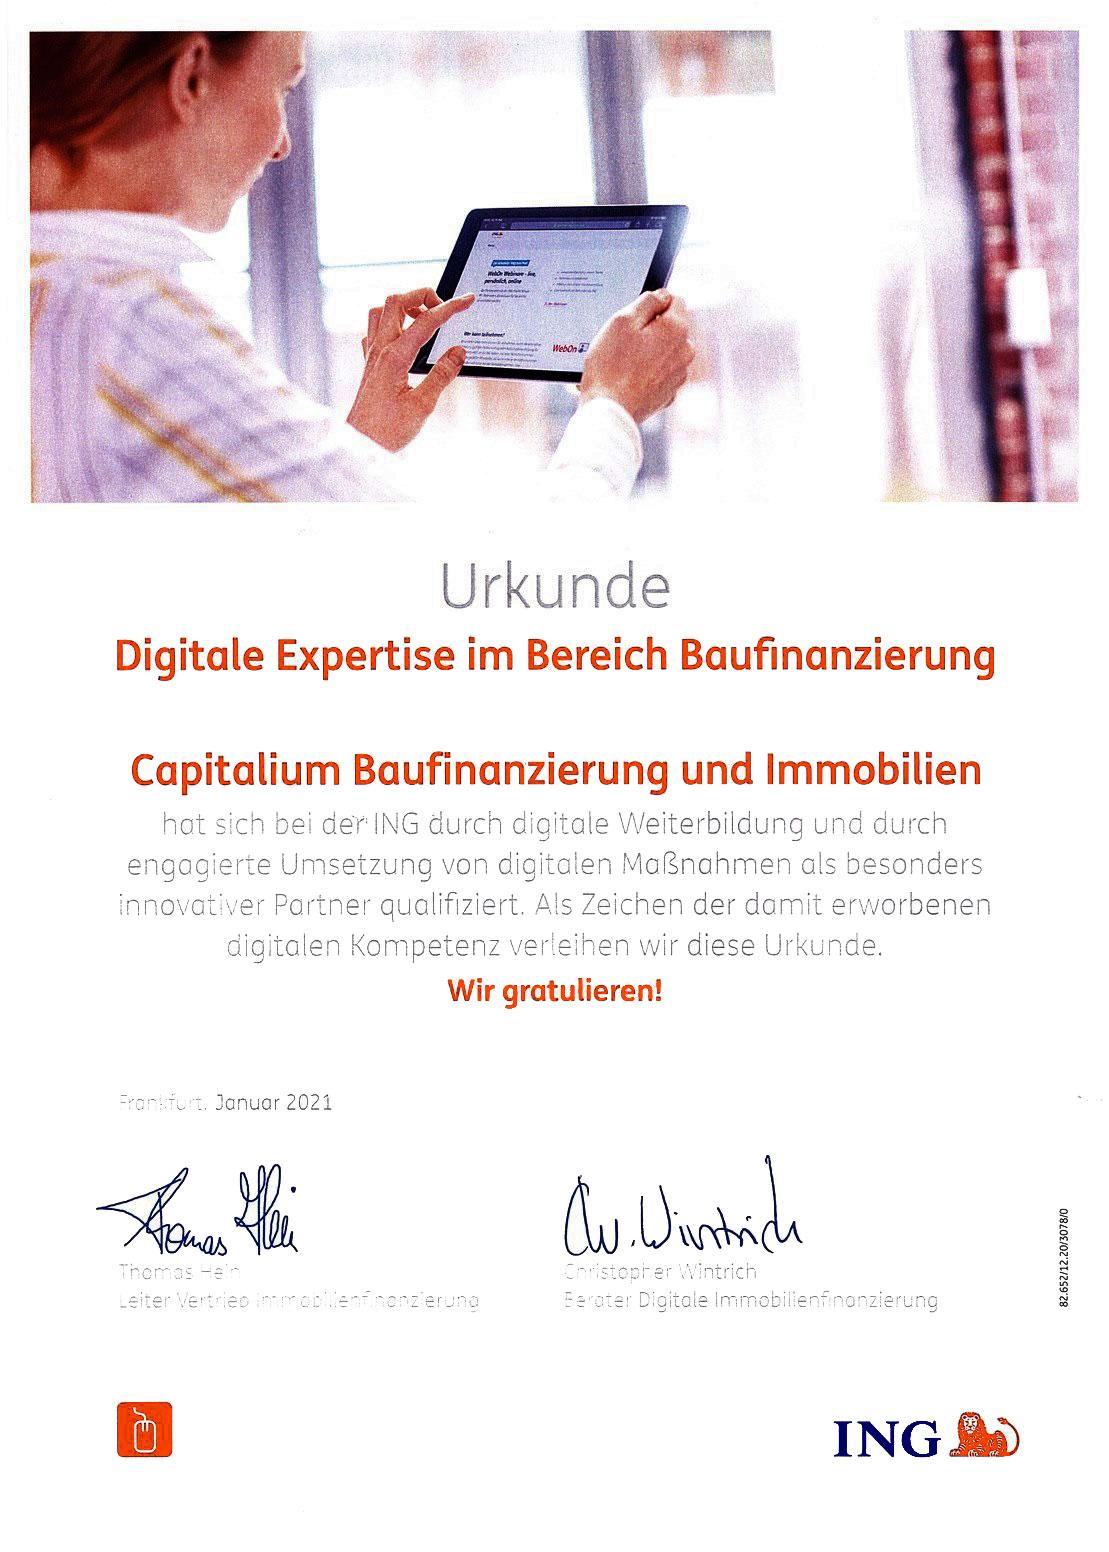 Urkunde-Digitale-Expertise-Capitalium-Finanberater-Baufinanzierung-Hamburg-Kredit-Immobilienkauf-Matthias-Drews-Baufi-ING-Diba